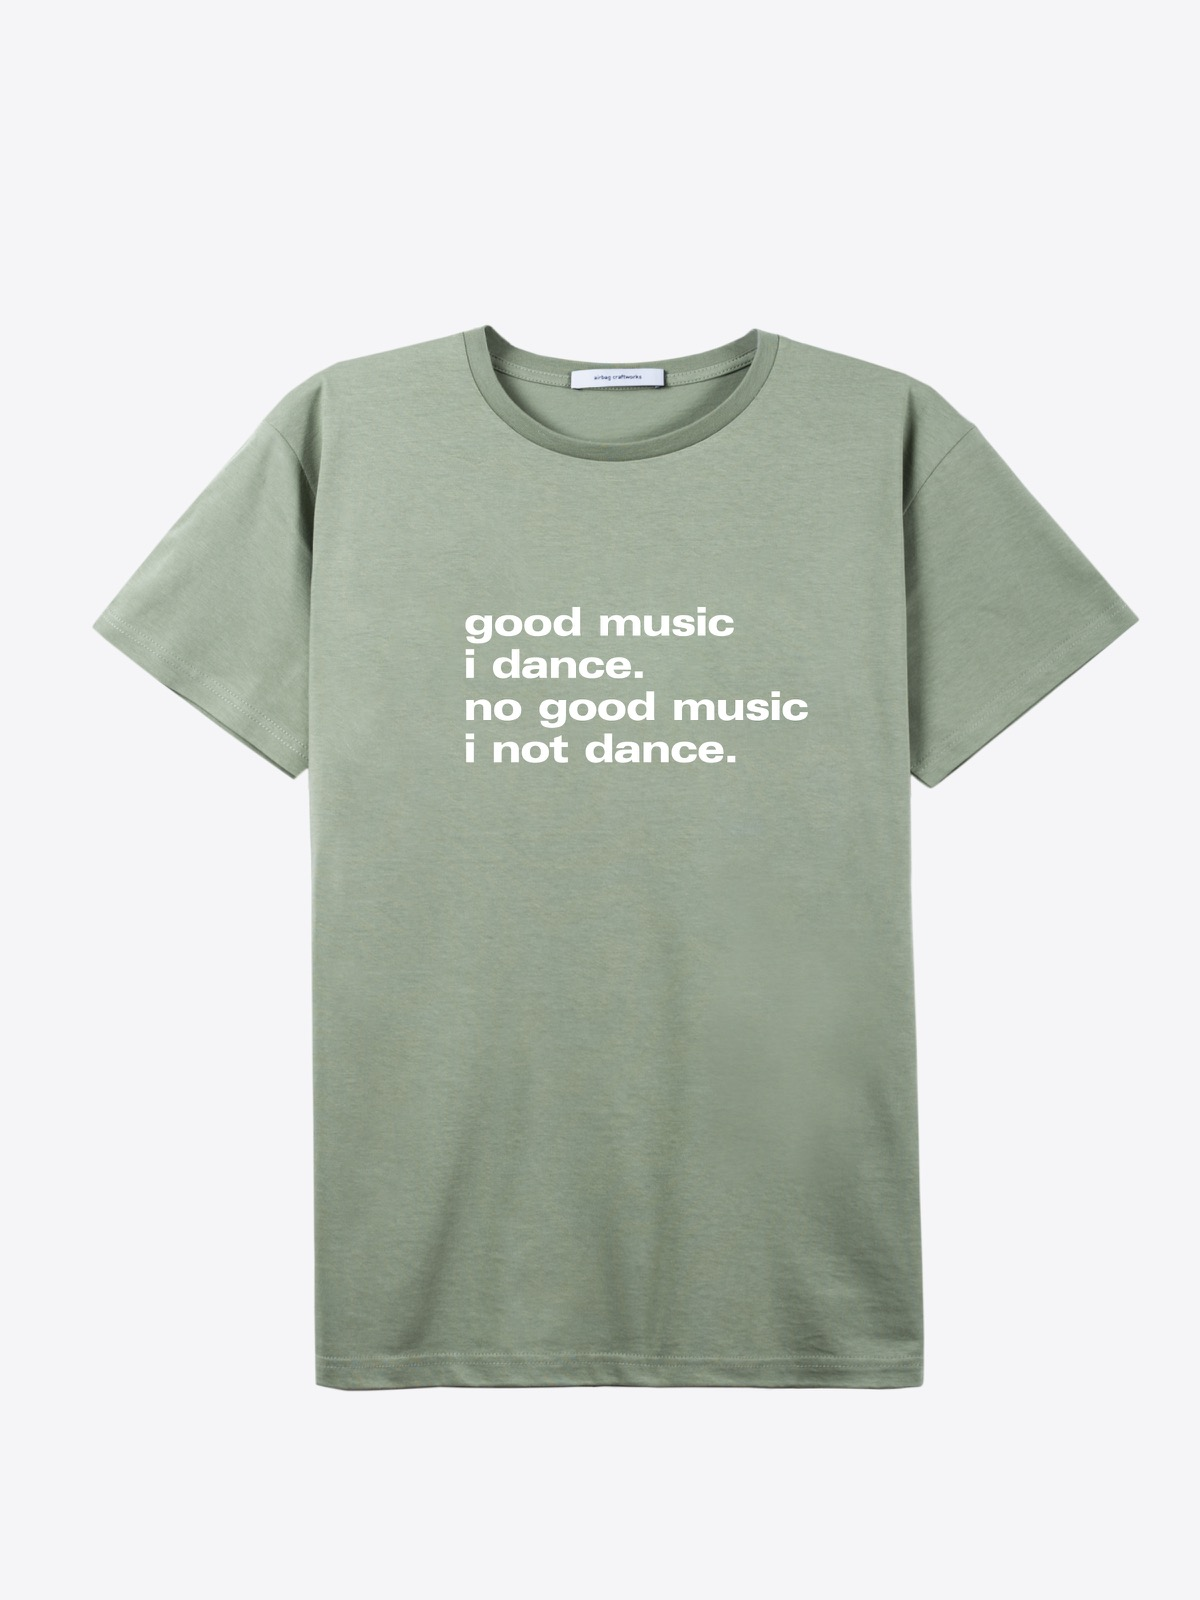 airbag craftworks good music i dance | sage green